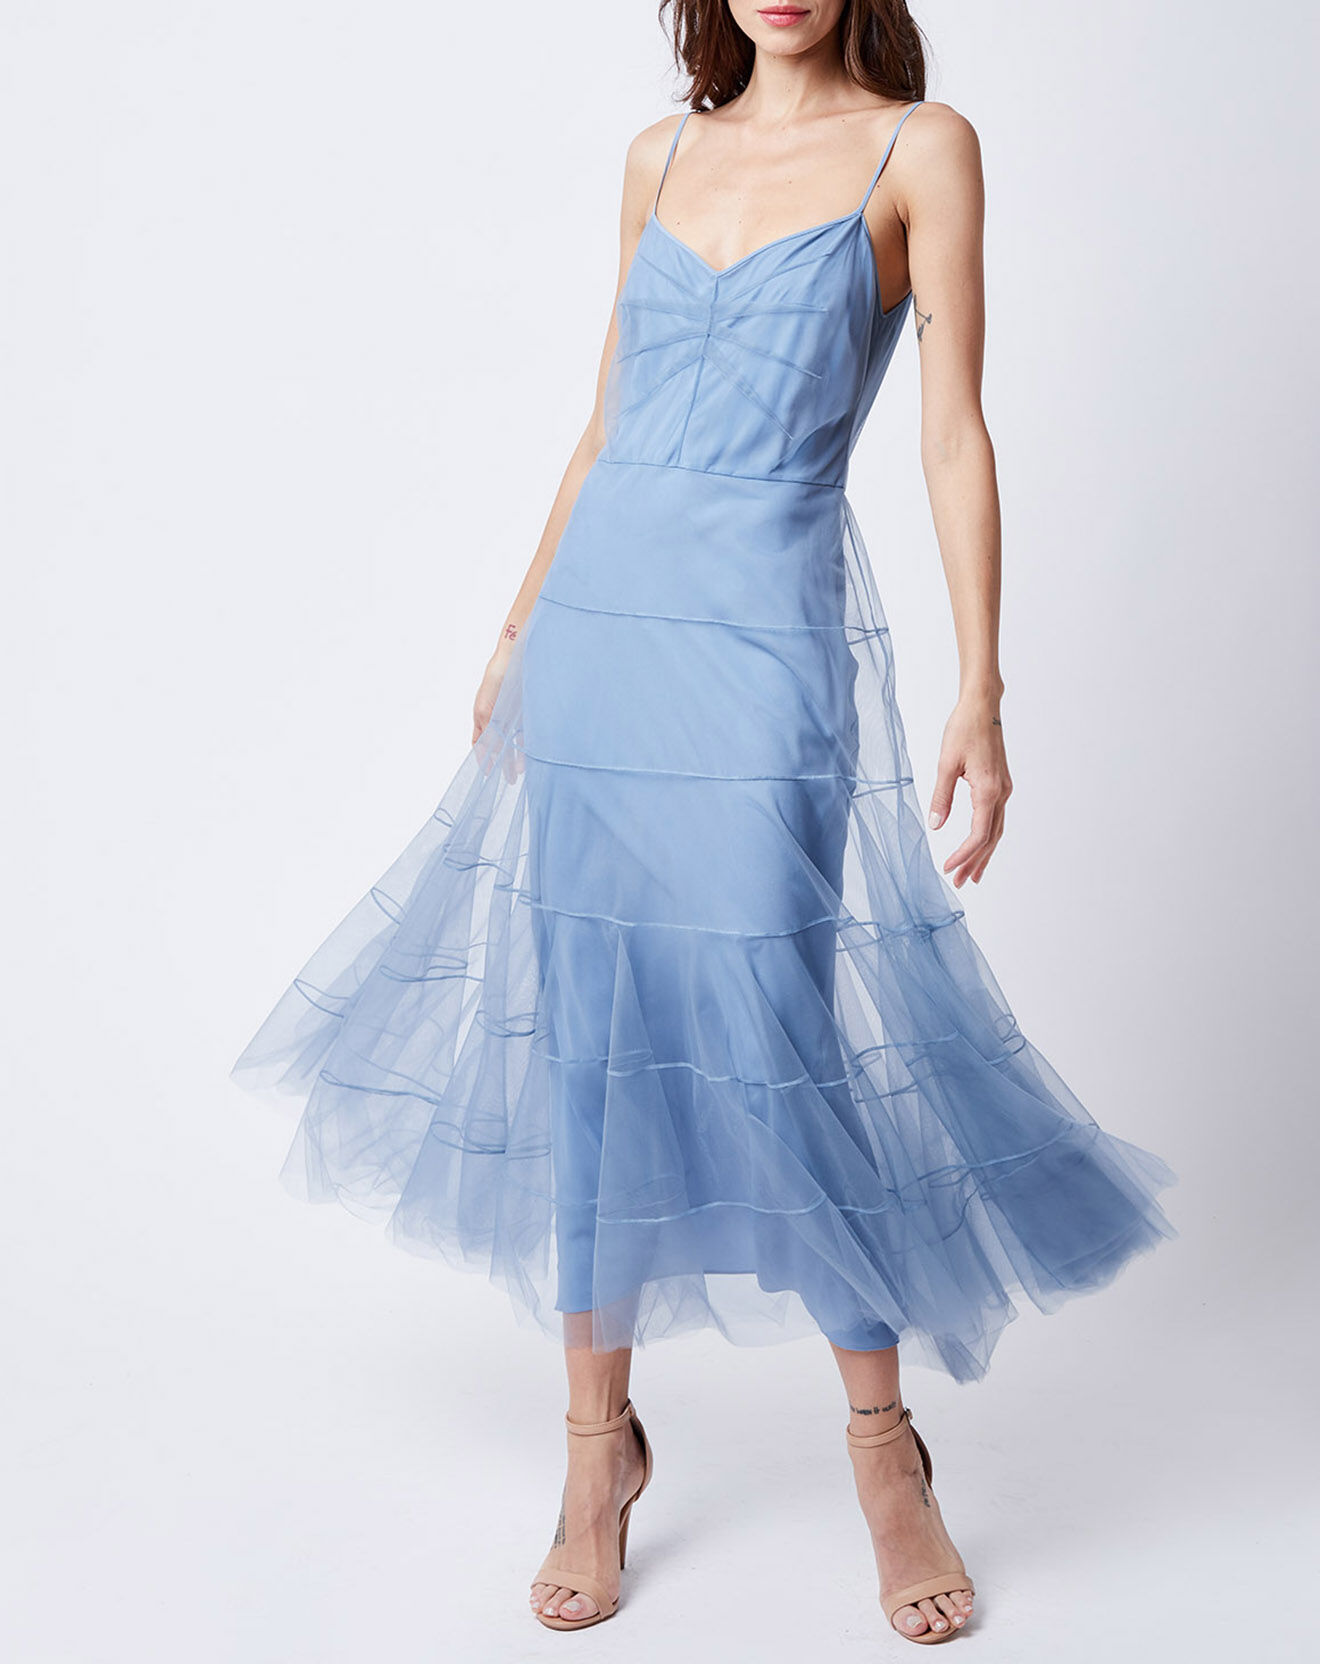 Robe mi-longue en Tulle et doublure Soie mélangée bleue - John Galliano - Modalova